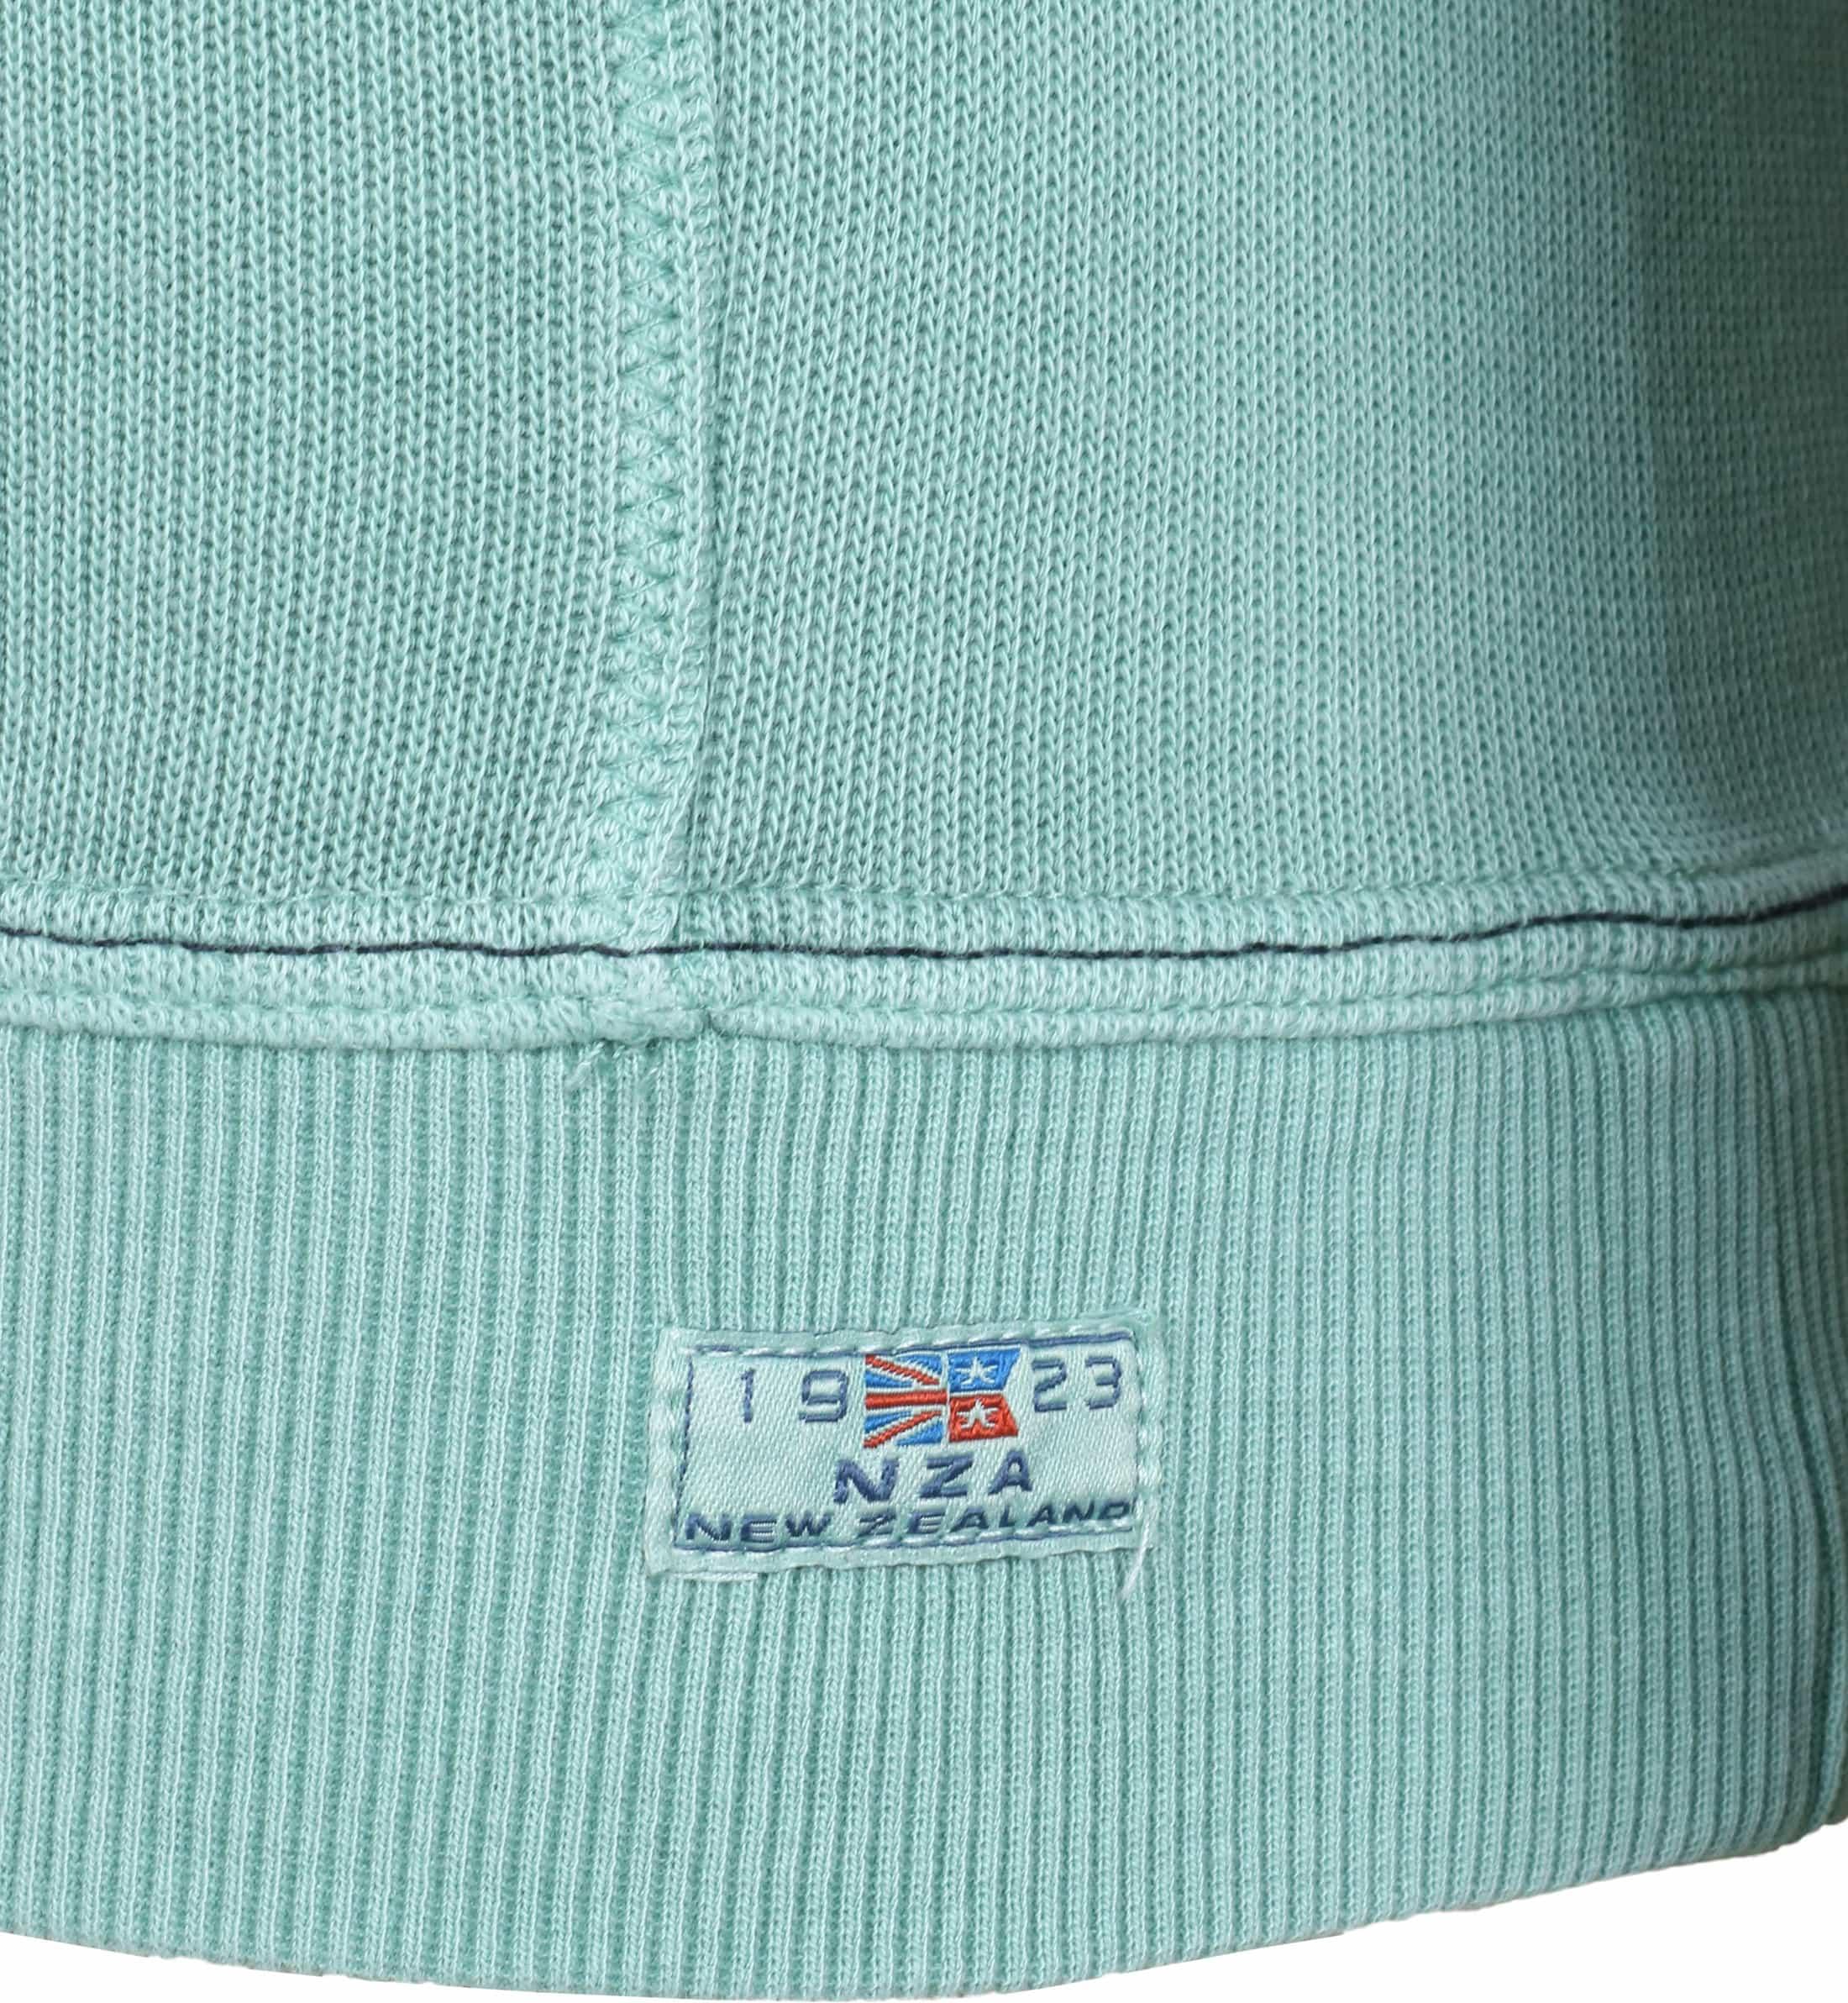 NZA Pullover Reißverschluss Grün foto 2